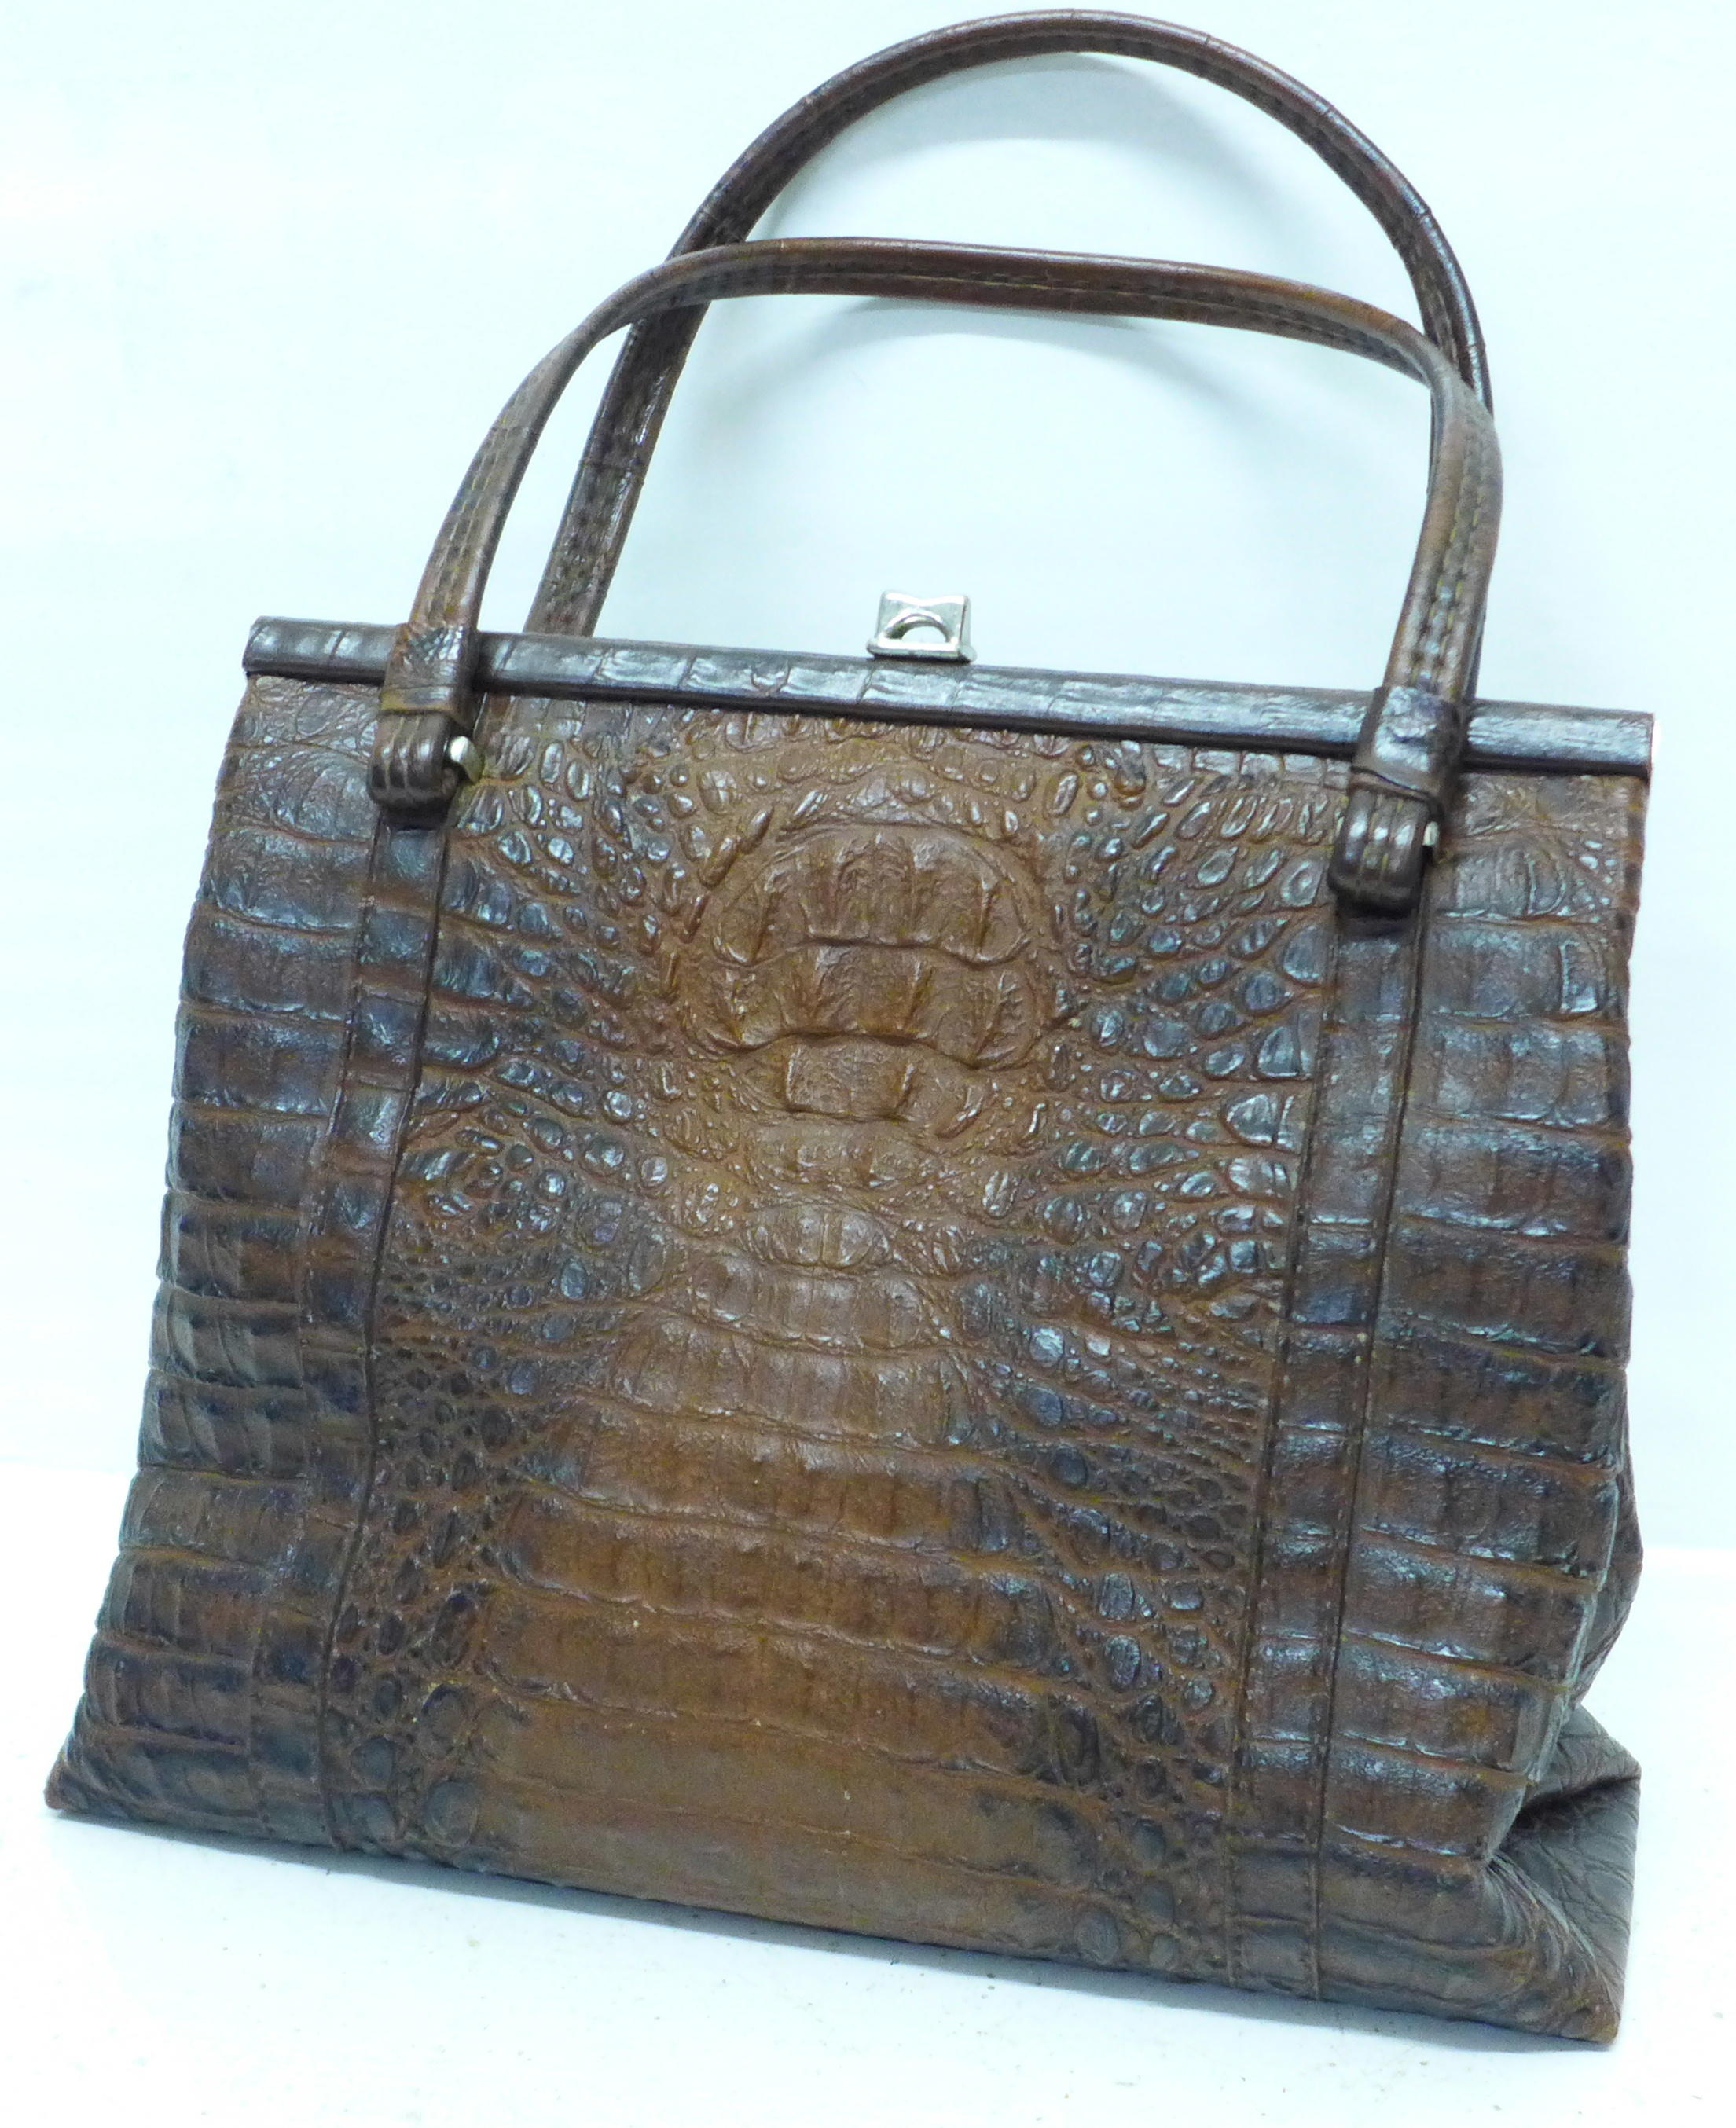 A Rieke vintage faux crocodile skin handbag